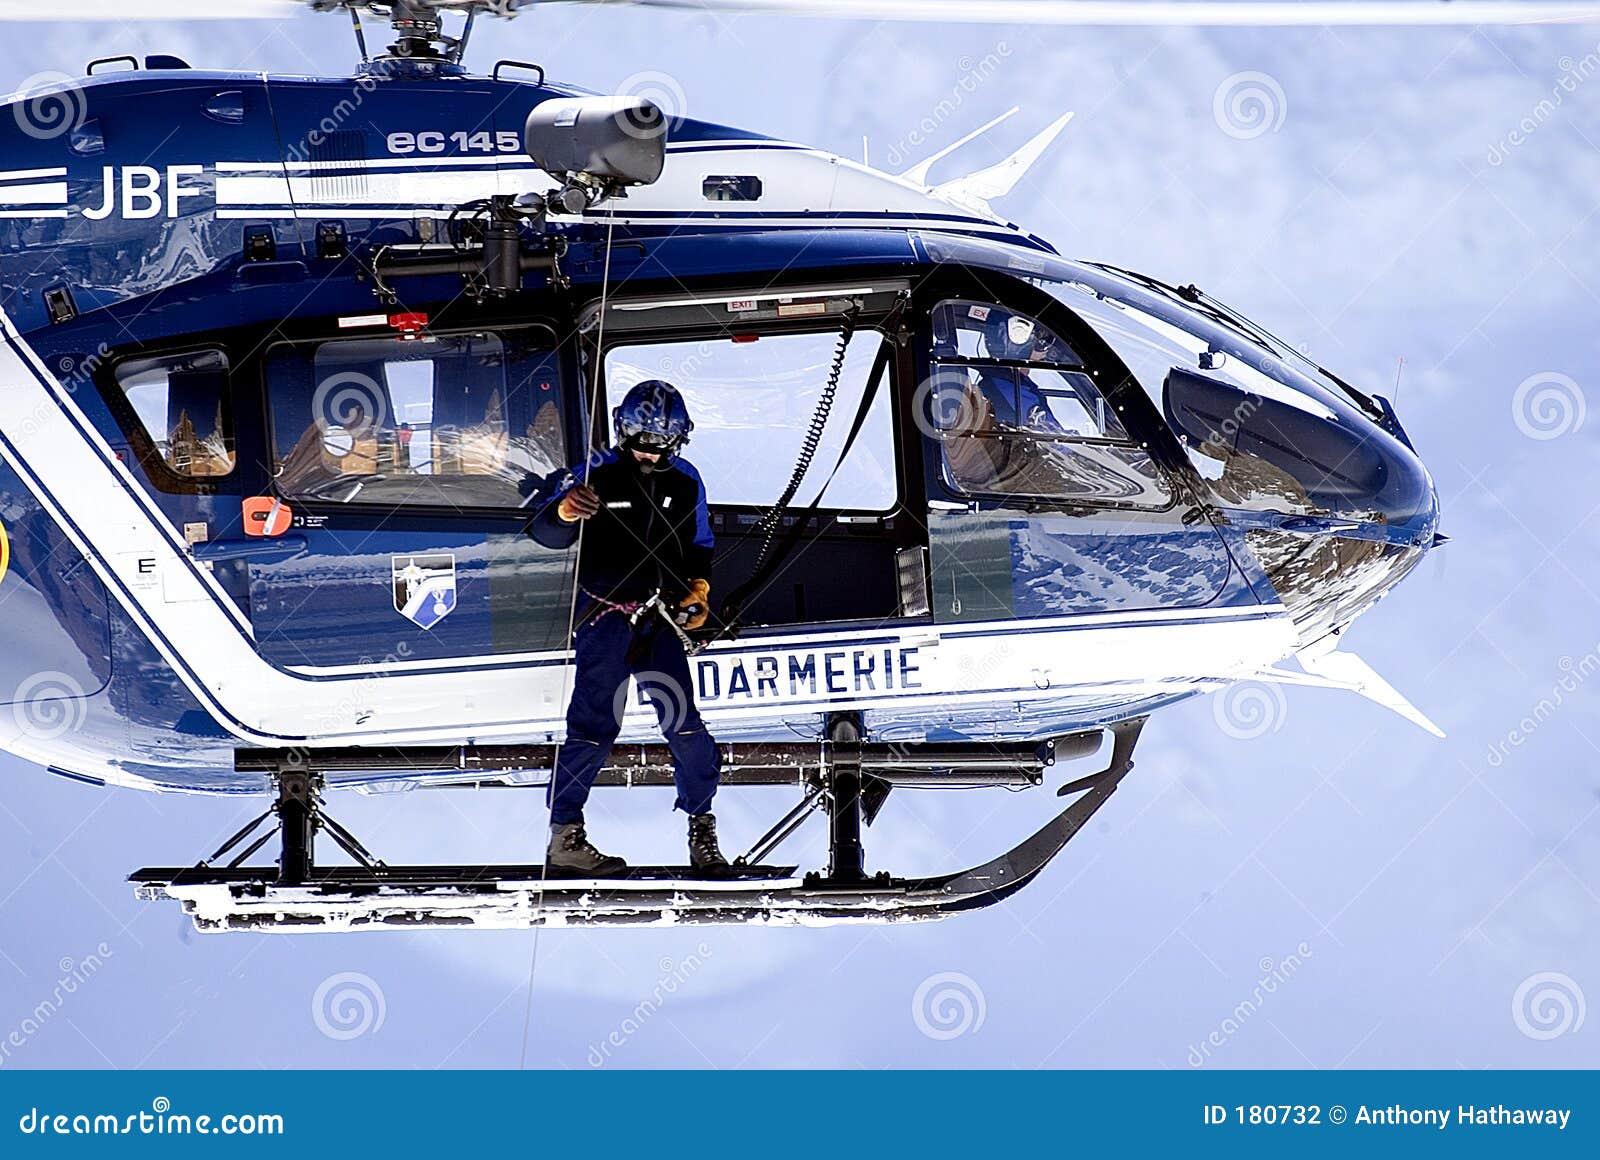 Hélicoptère #1 de sauvetage